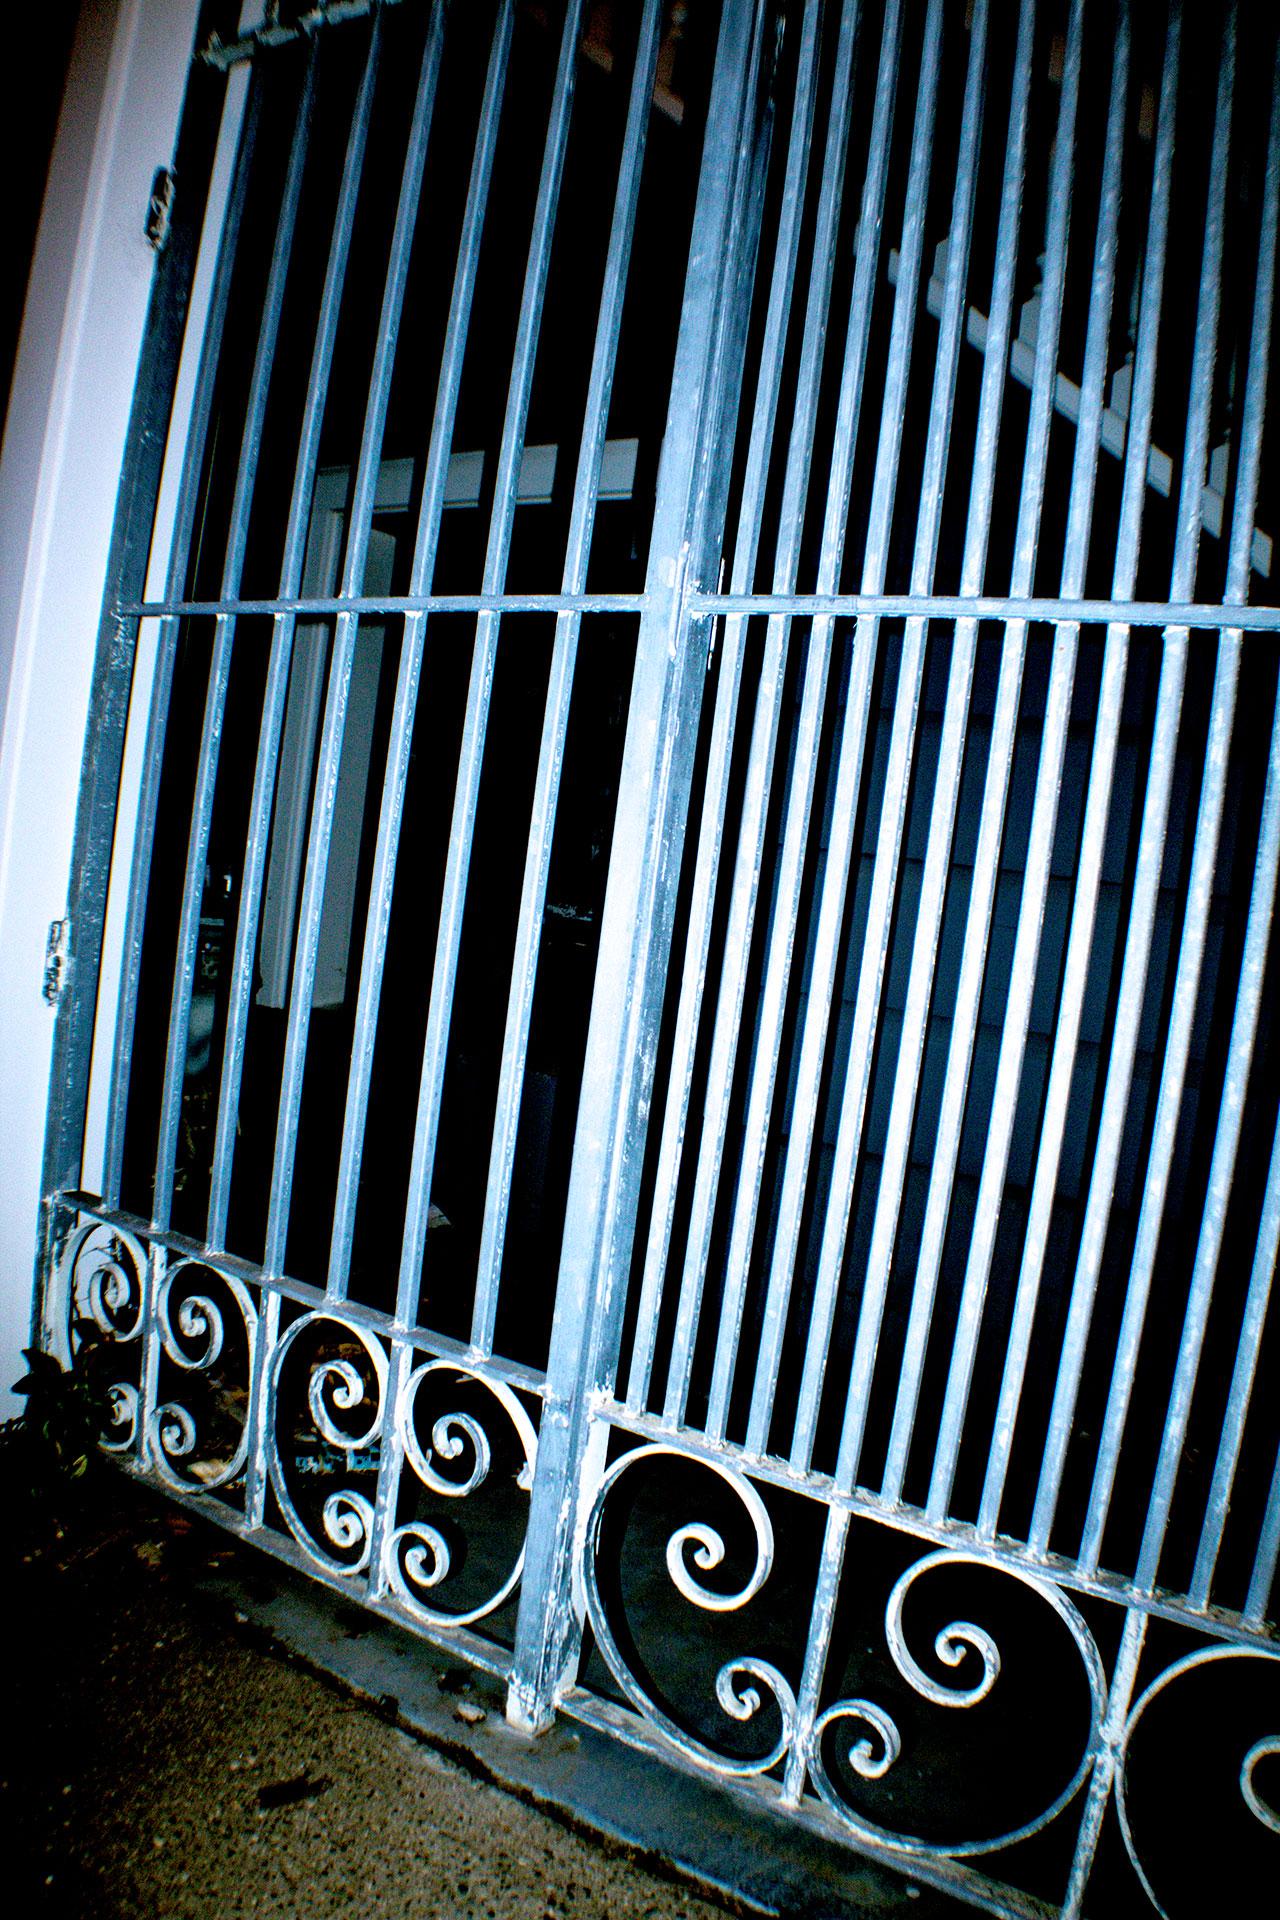 gate to a dark neighborhood